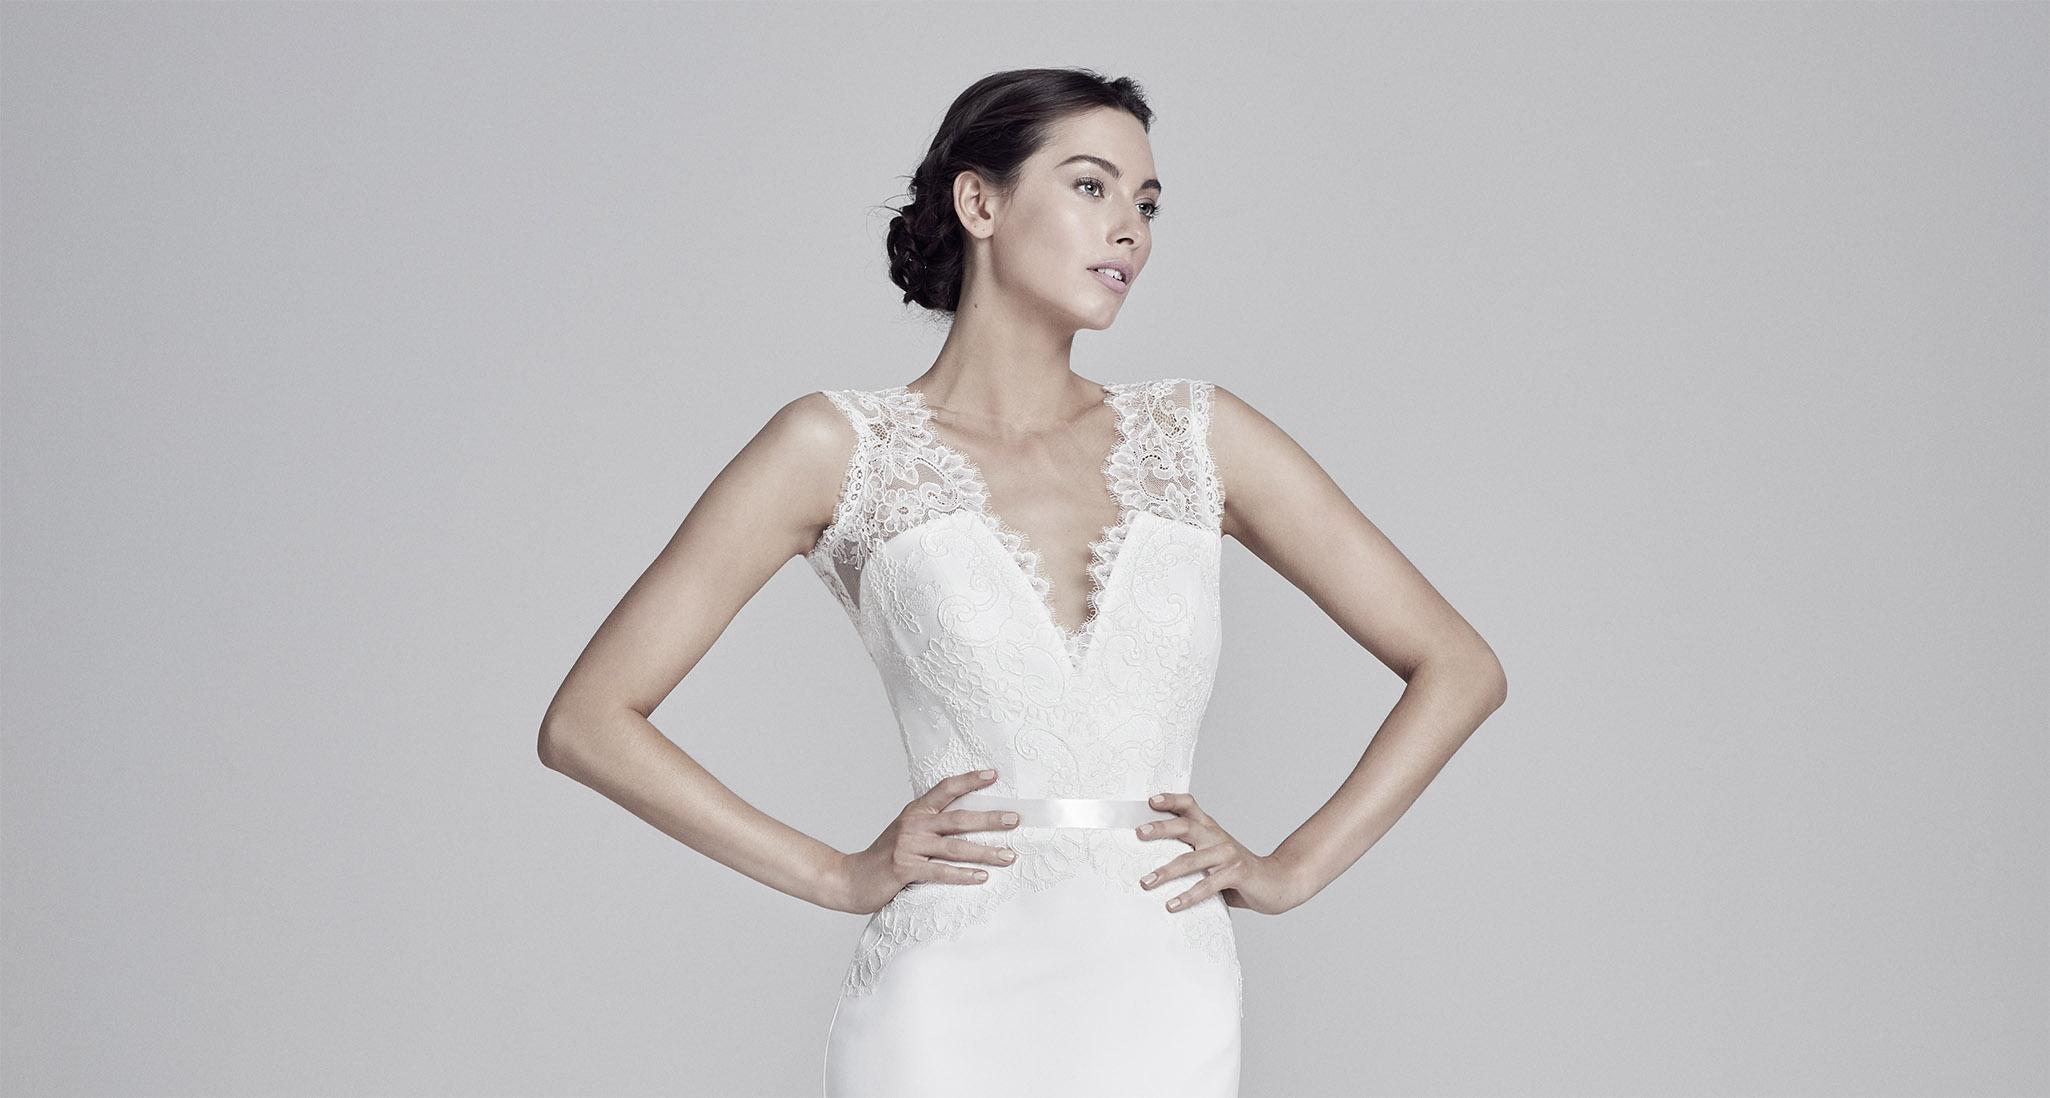 Tina Valerdi 2019 Wedding Dresses: White Swan Dry Cleaners